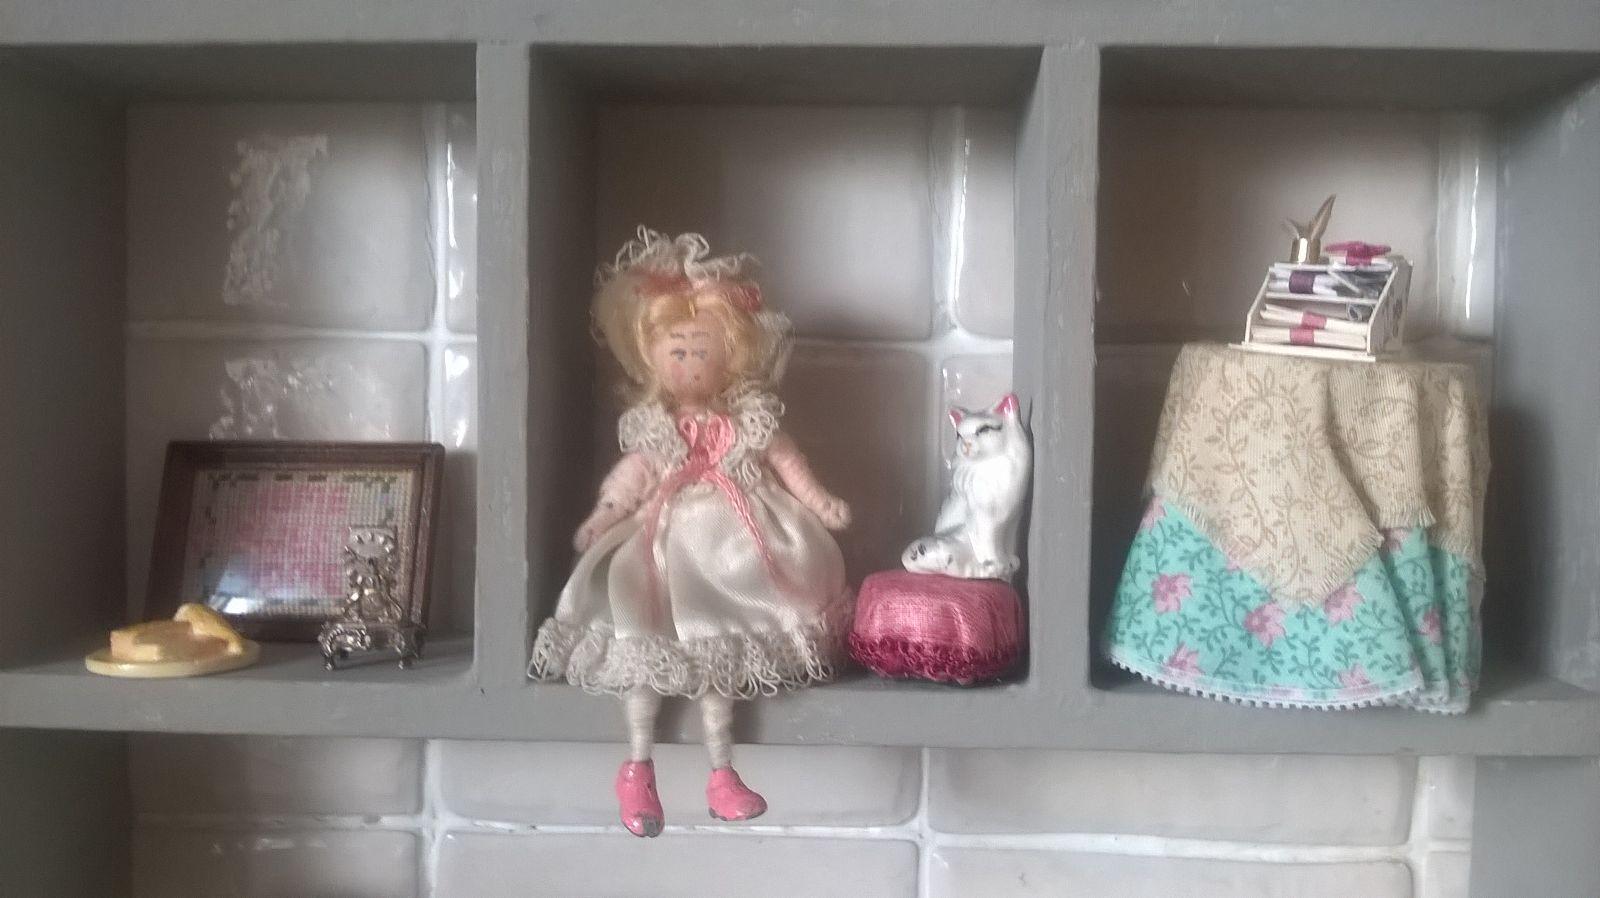 Middle shelf